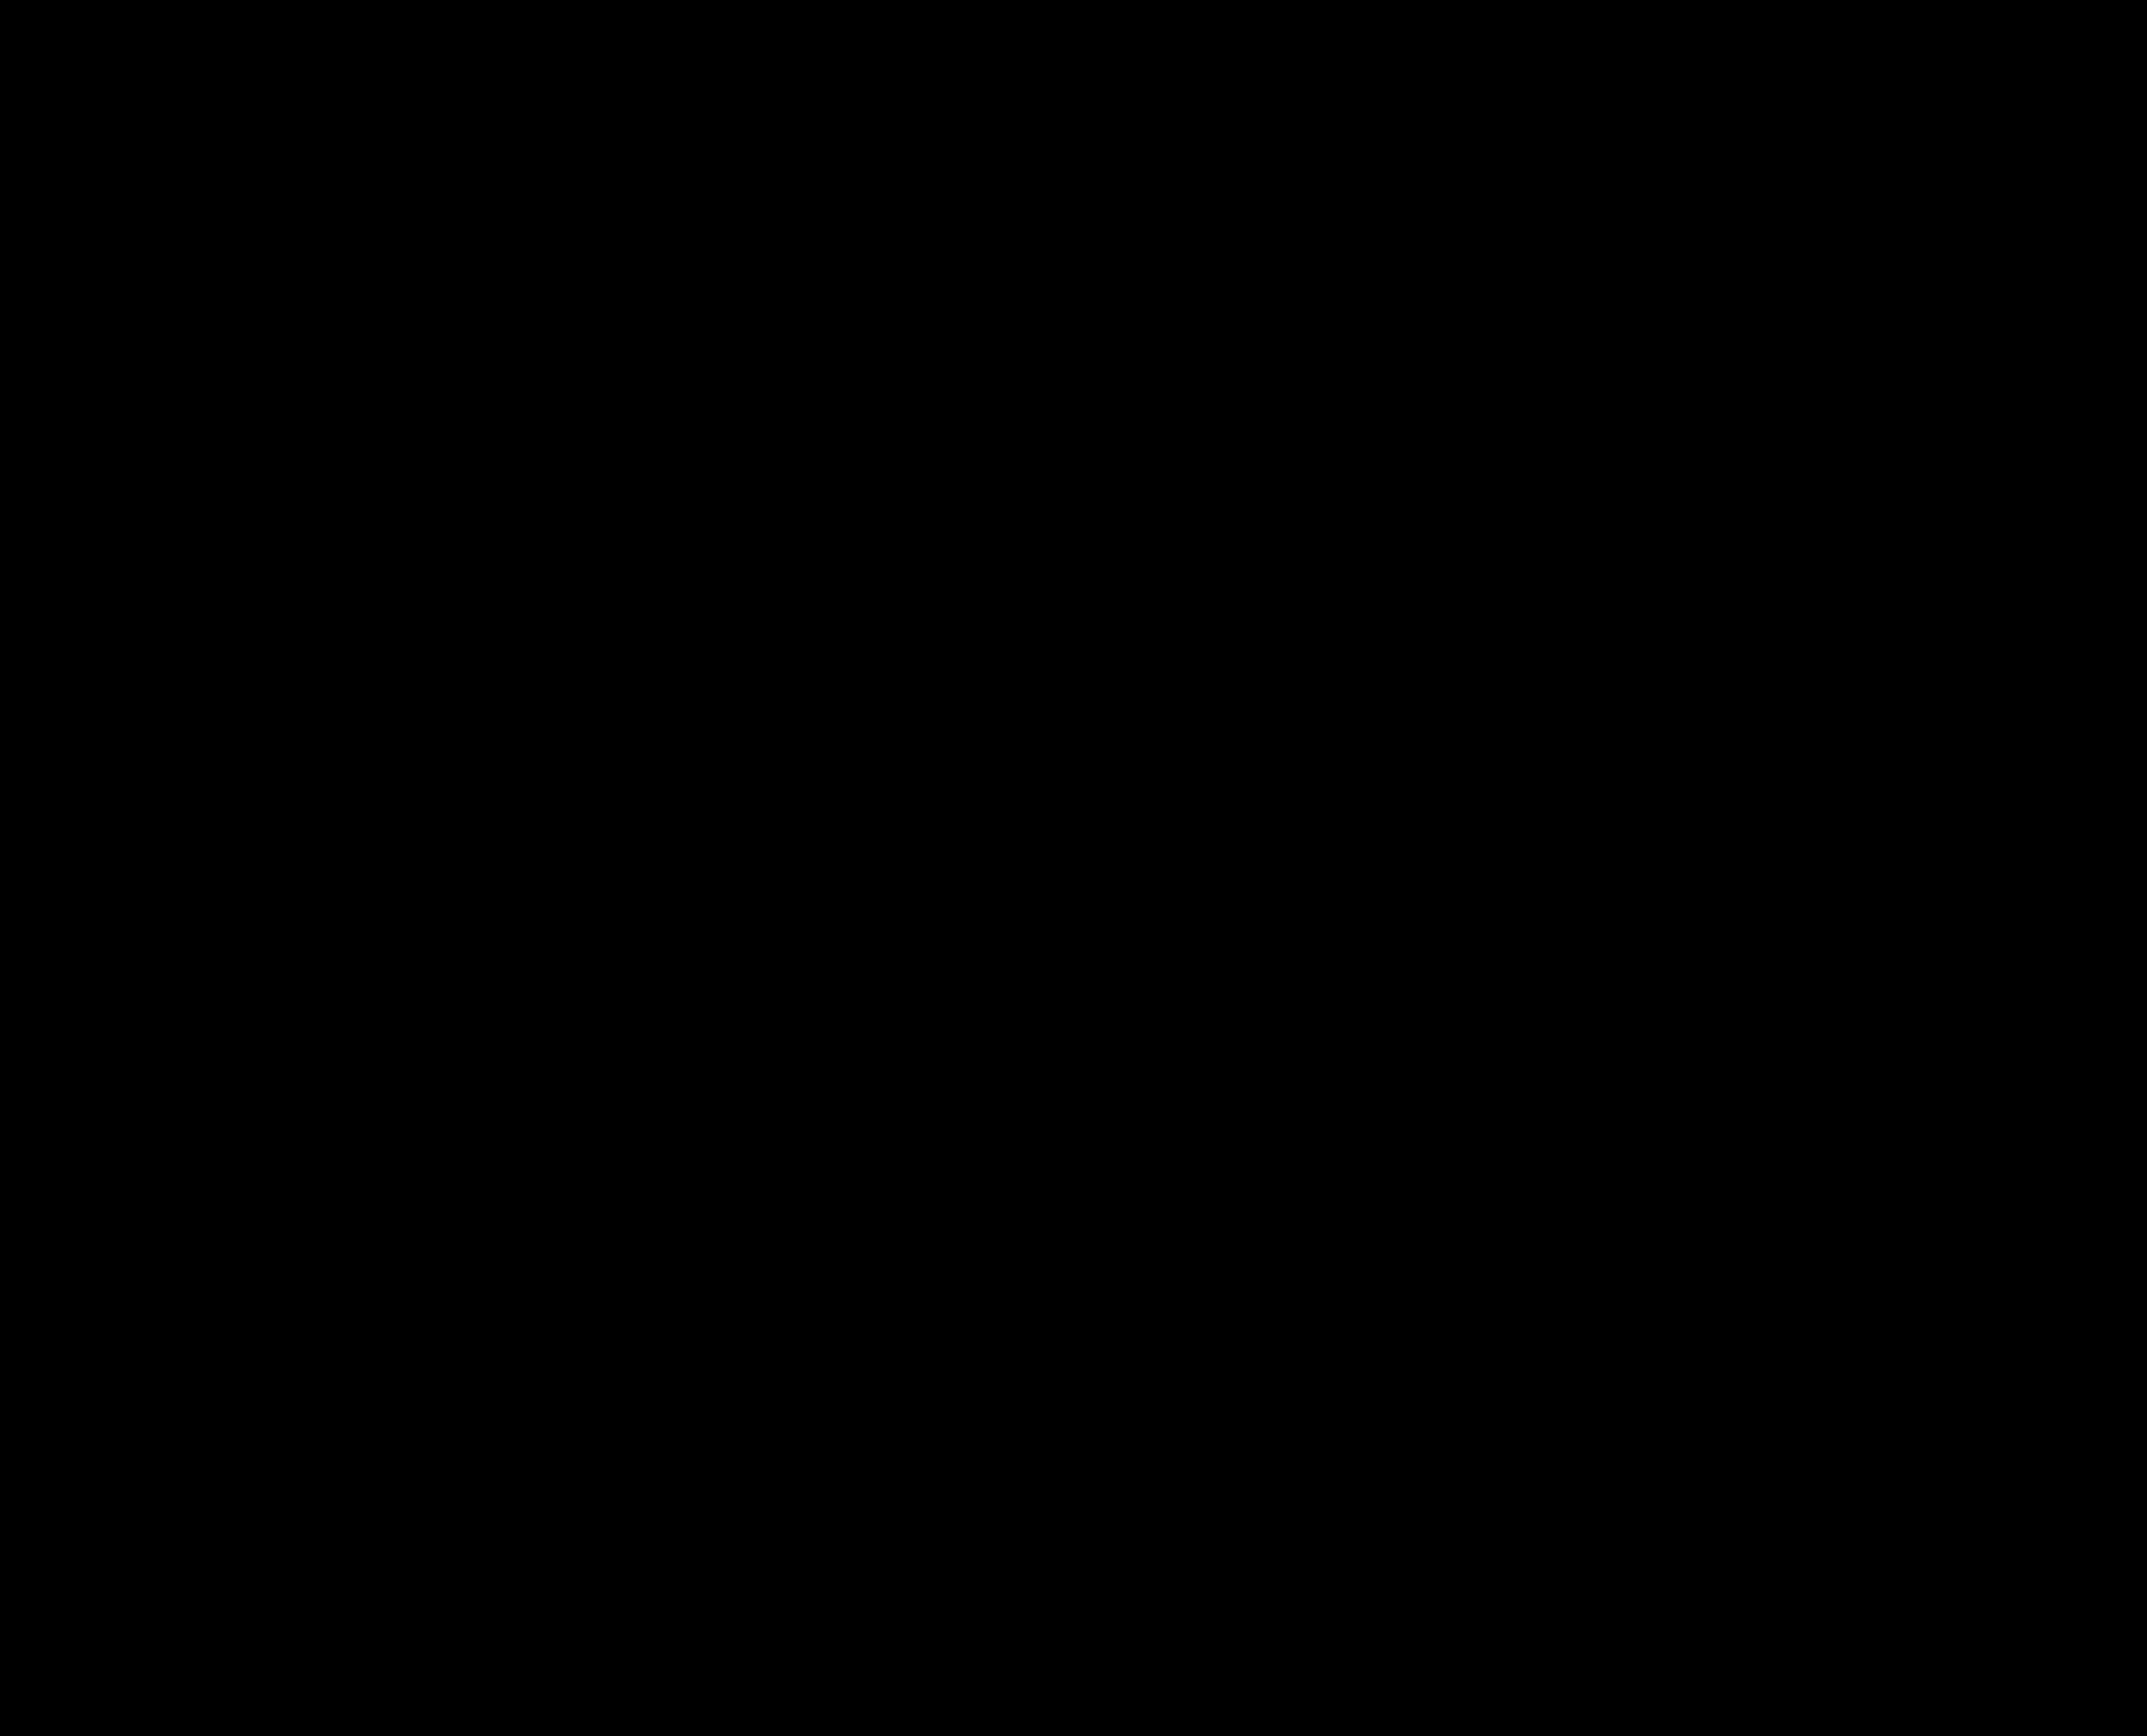 shred-mobb-logo.png